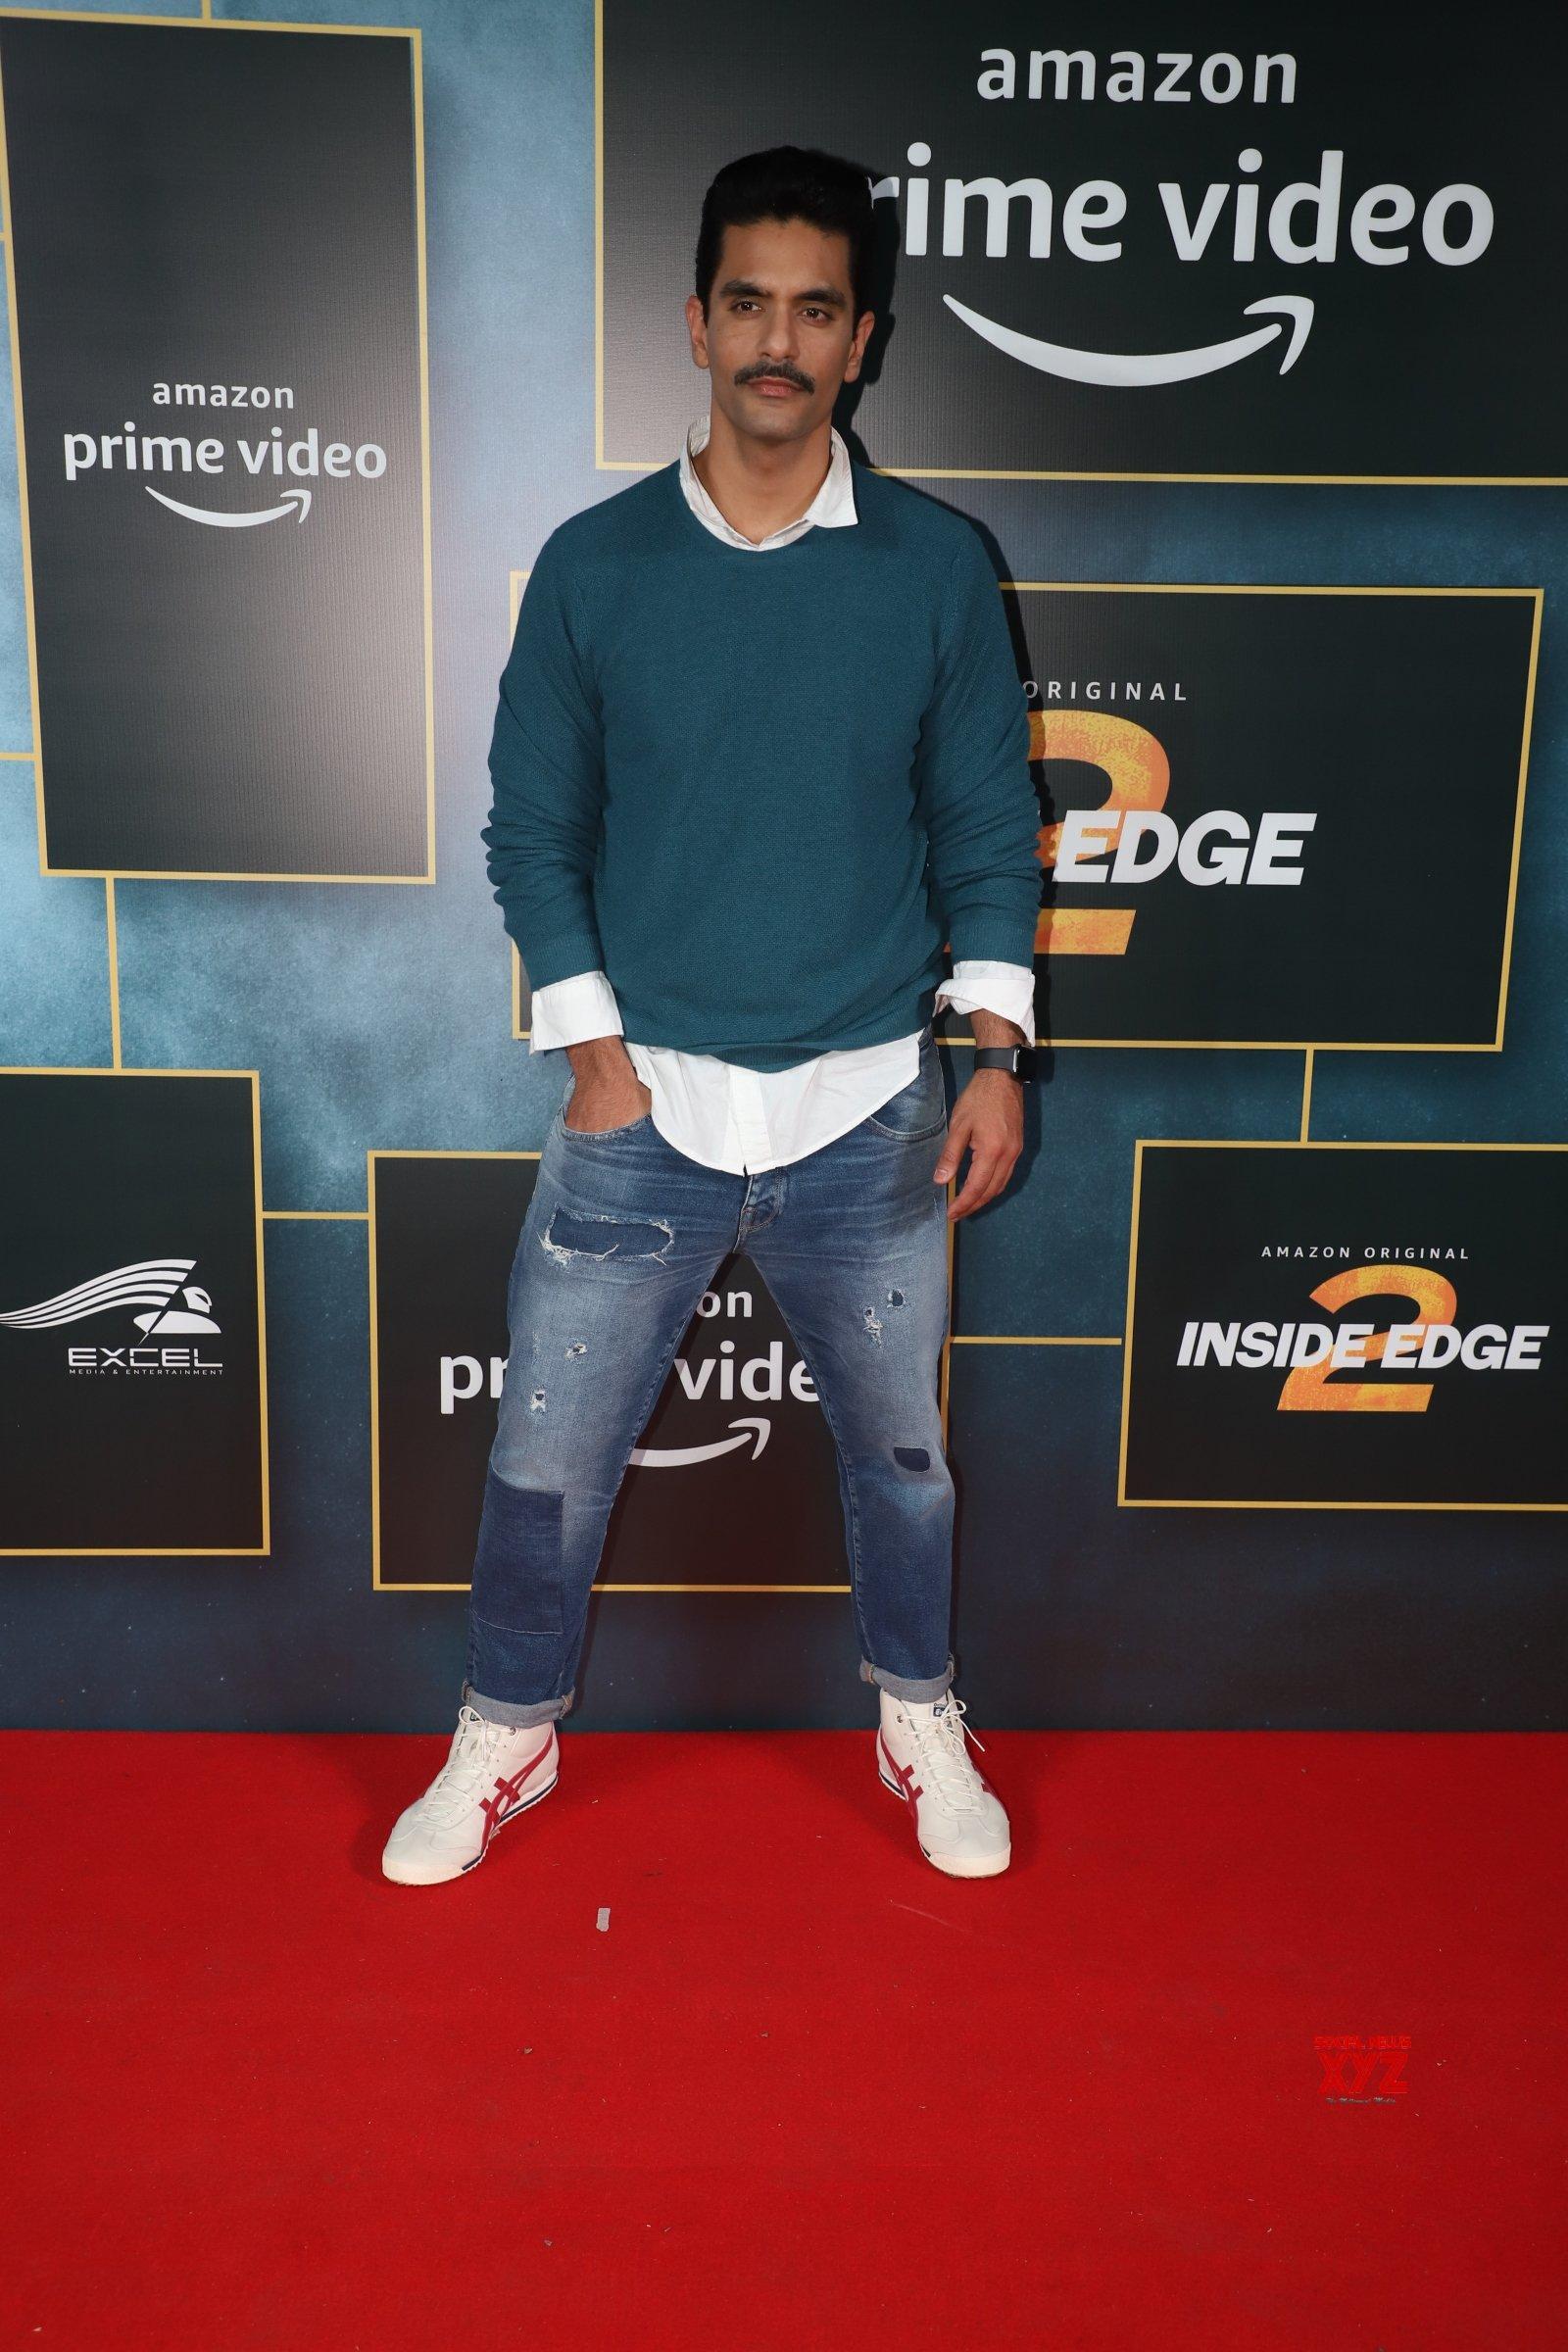 Amazon Prime's Inside Edge Season 2 Launch At JW Marriott In Juhu - Gallery